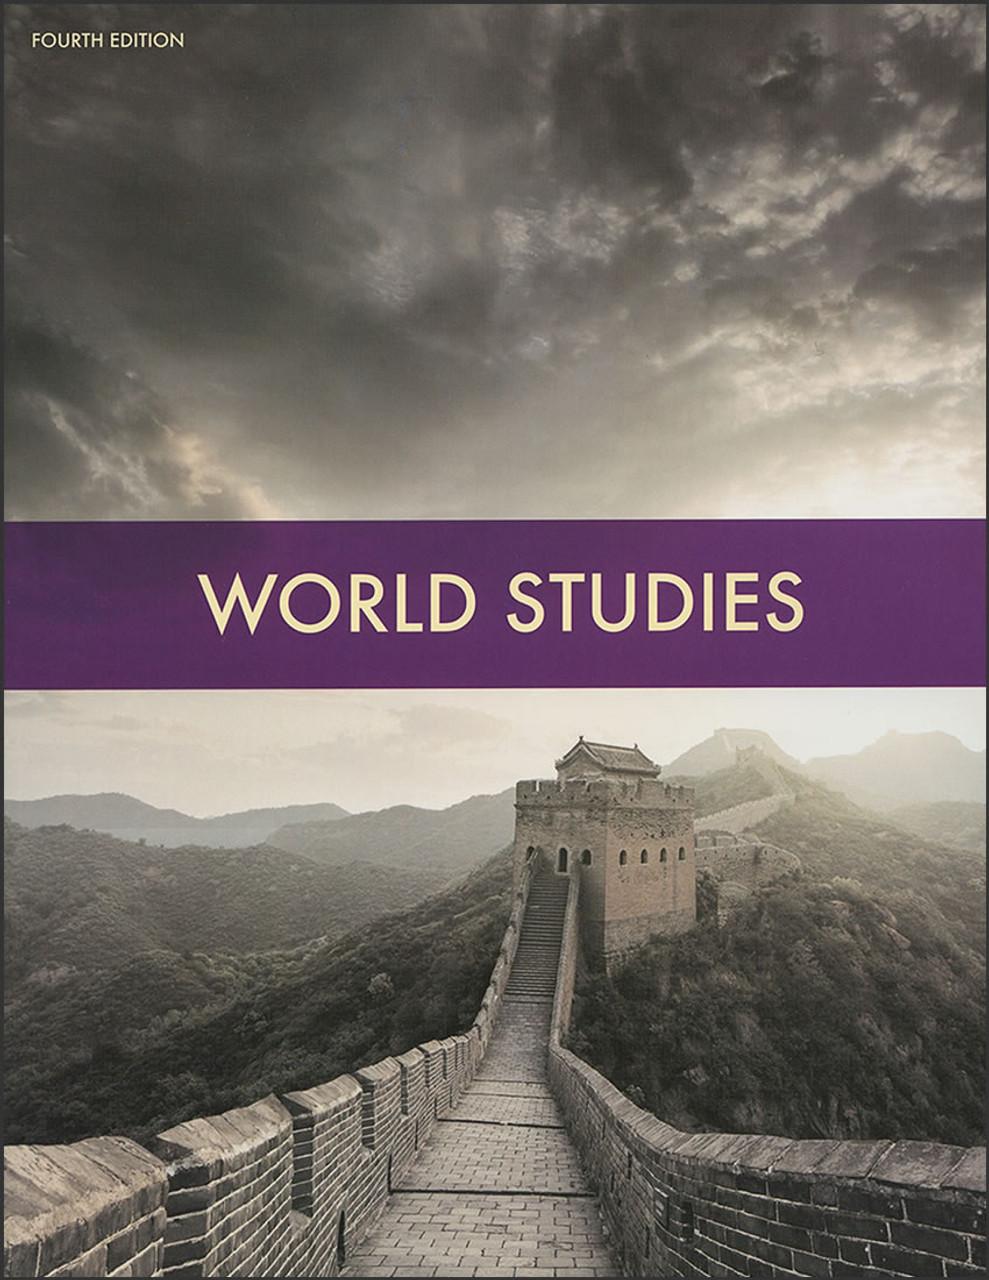 World Studies, 4th edition